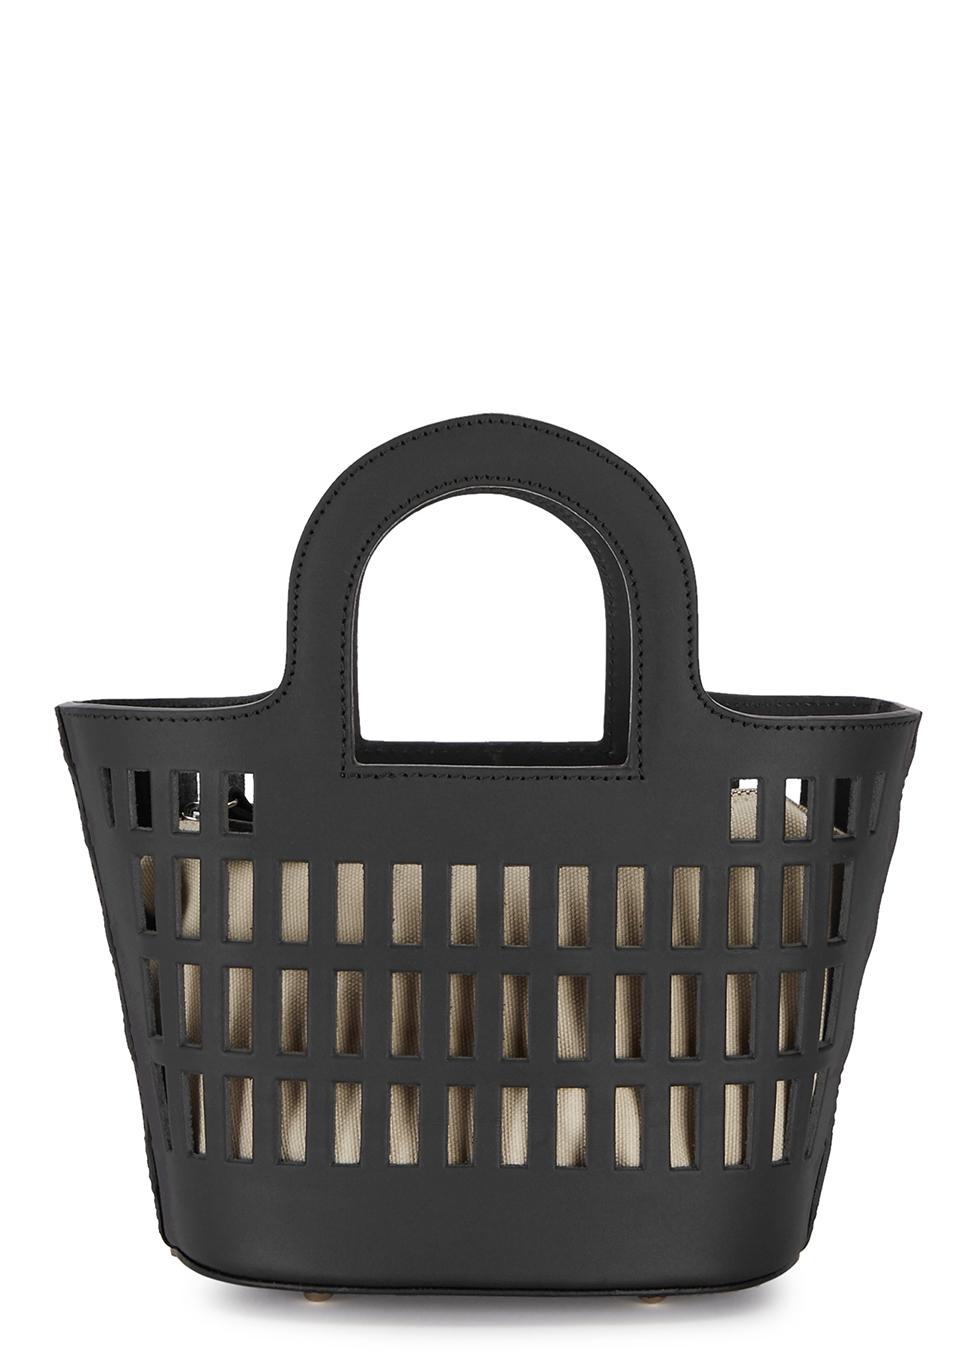 Colmado black leather top handle bag - Hereu